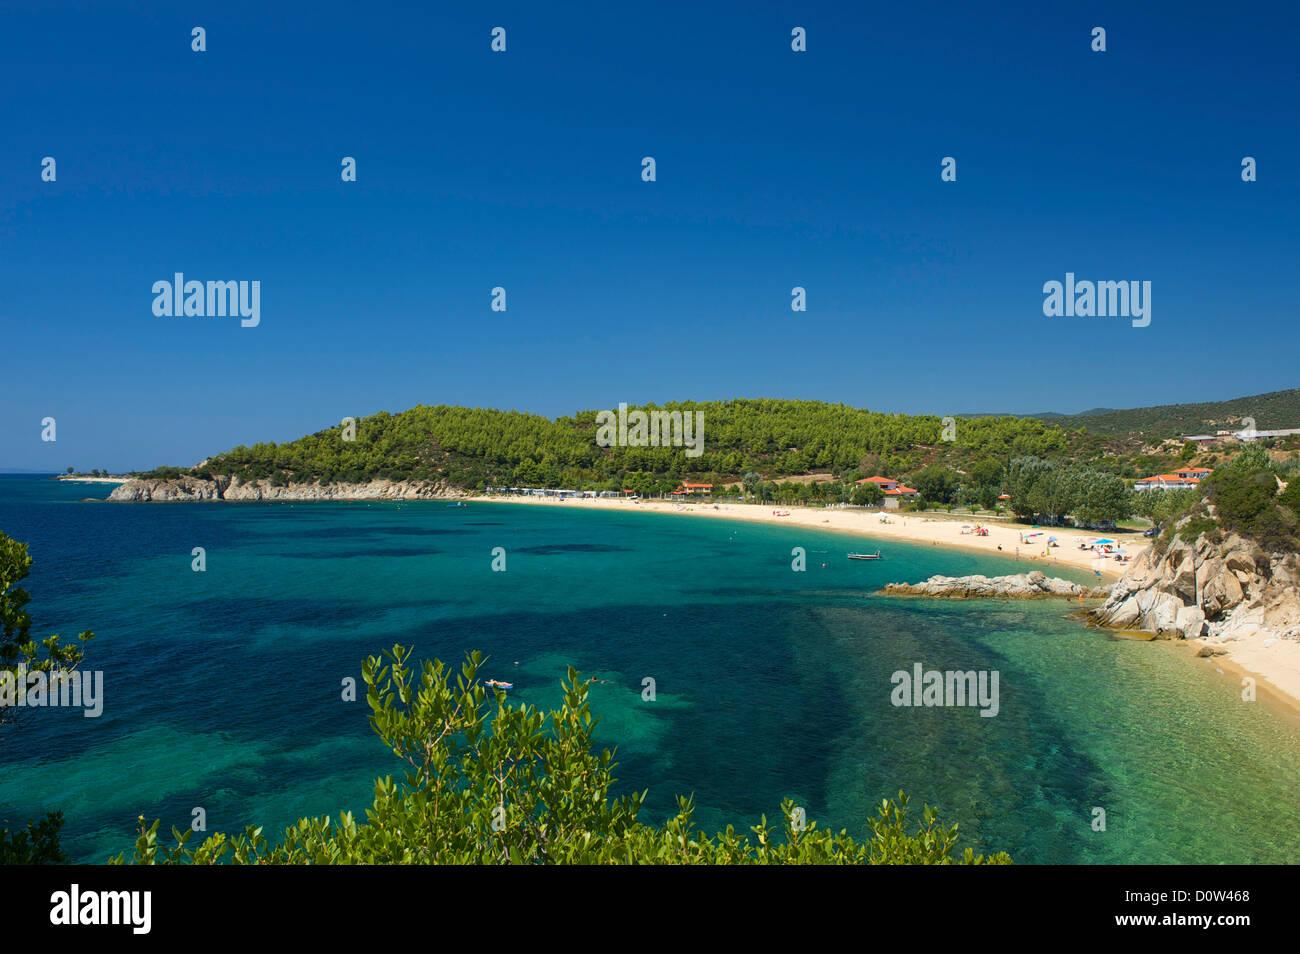 Chalkidiki, Griechenland, Chalkidiki, Reisen, Urlaub, Europa, europäisch, Tag, Stockbild